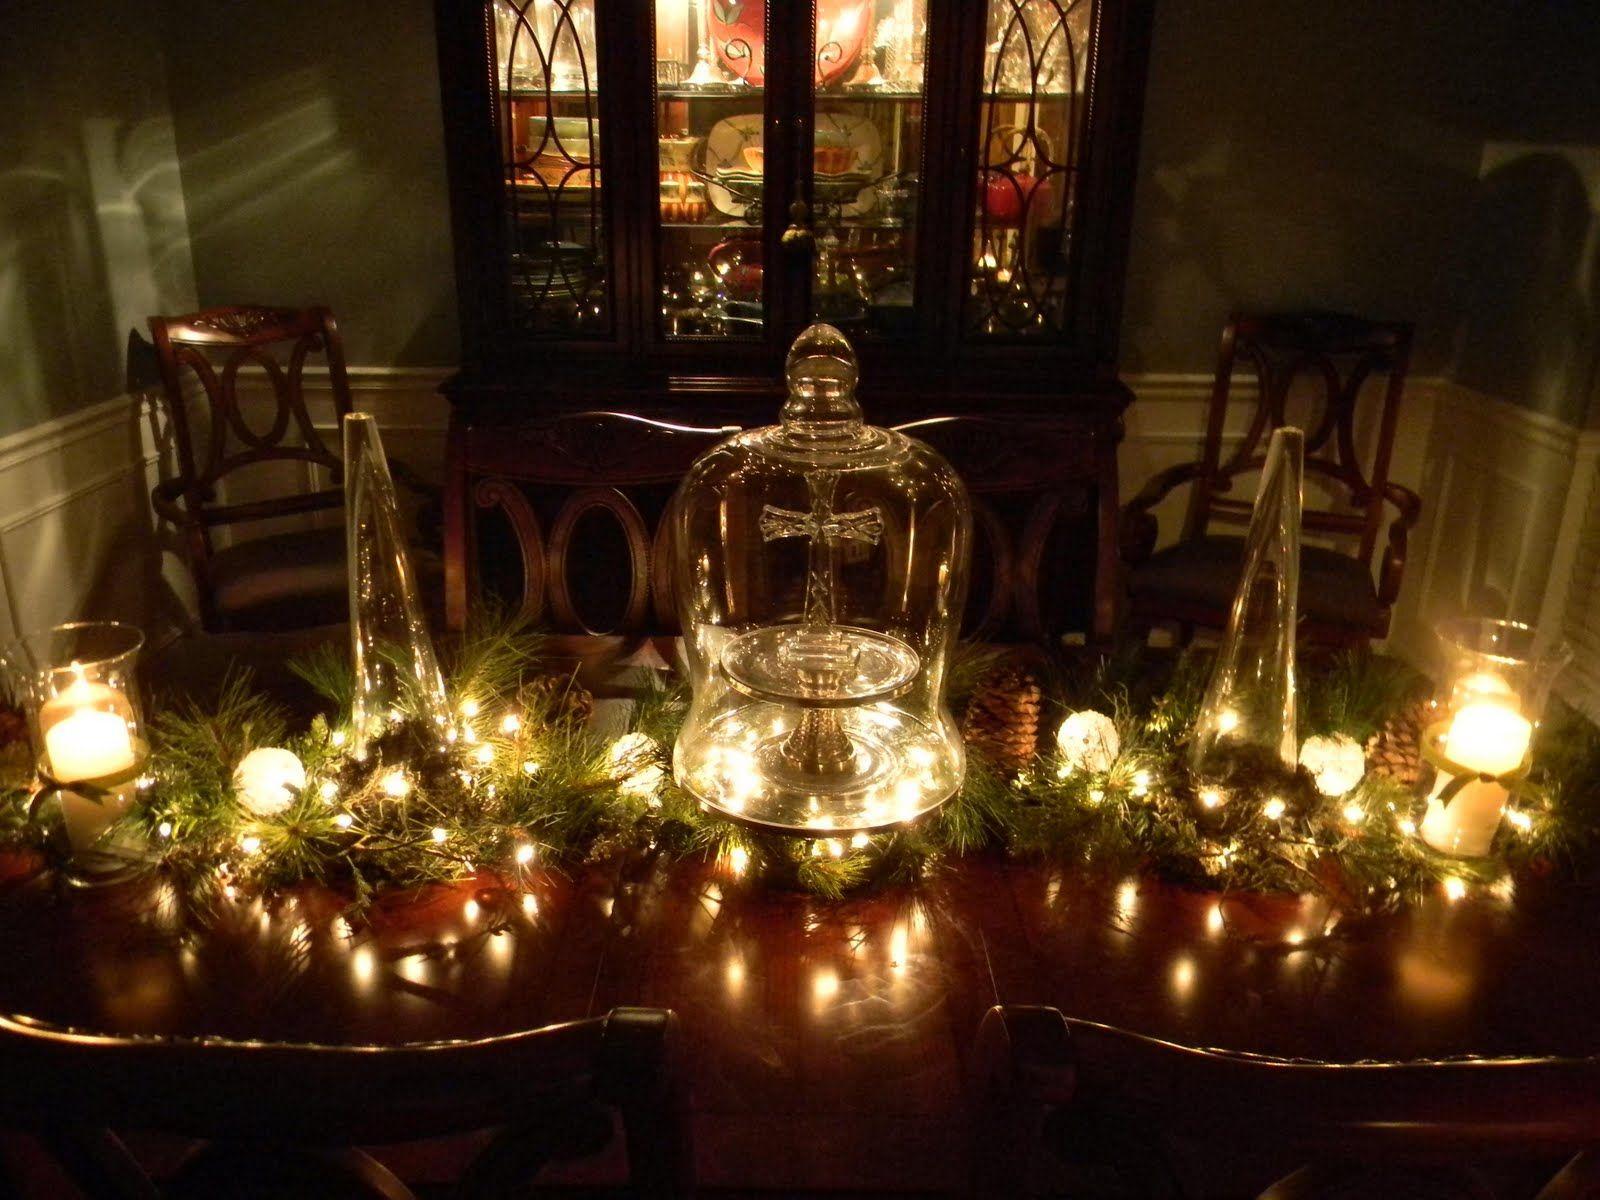 14 Best Christmas Table Decor Images On Pinterest